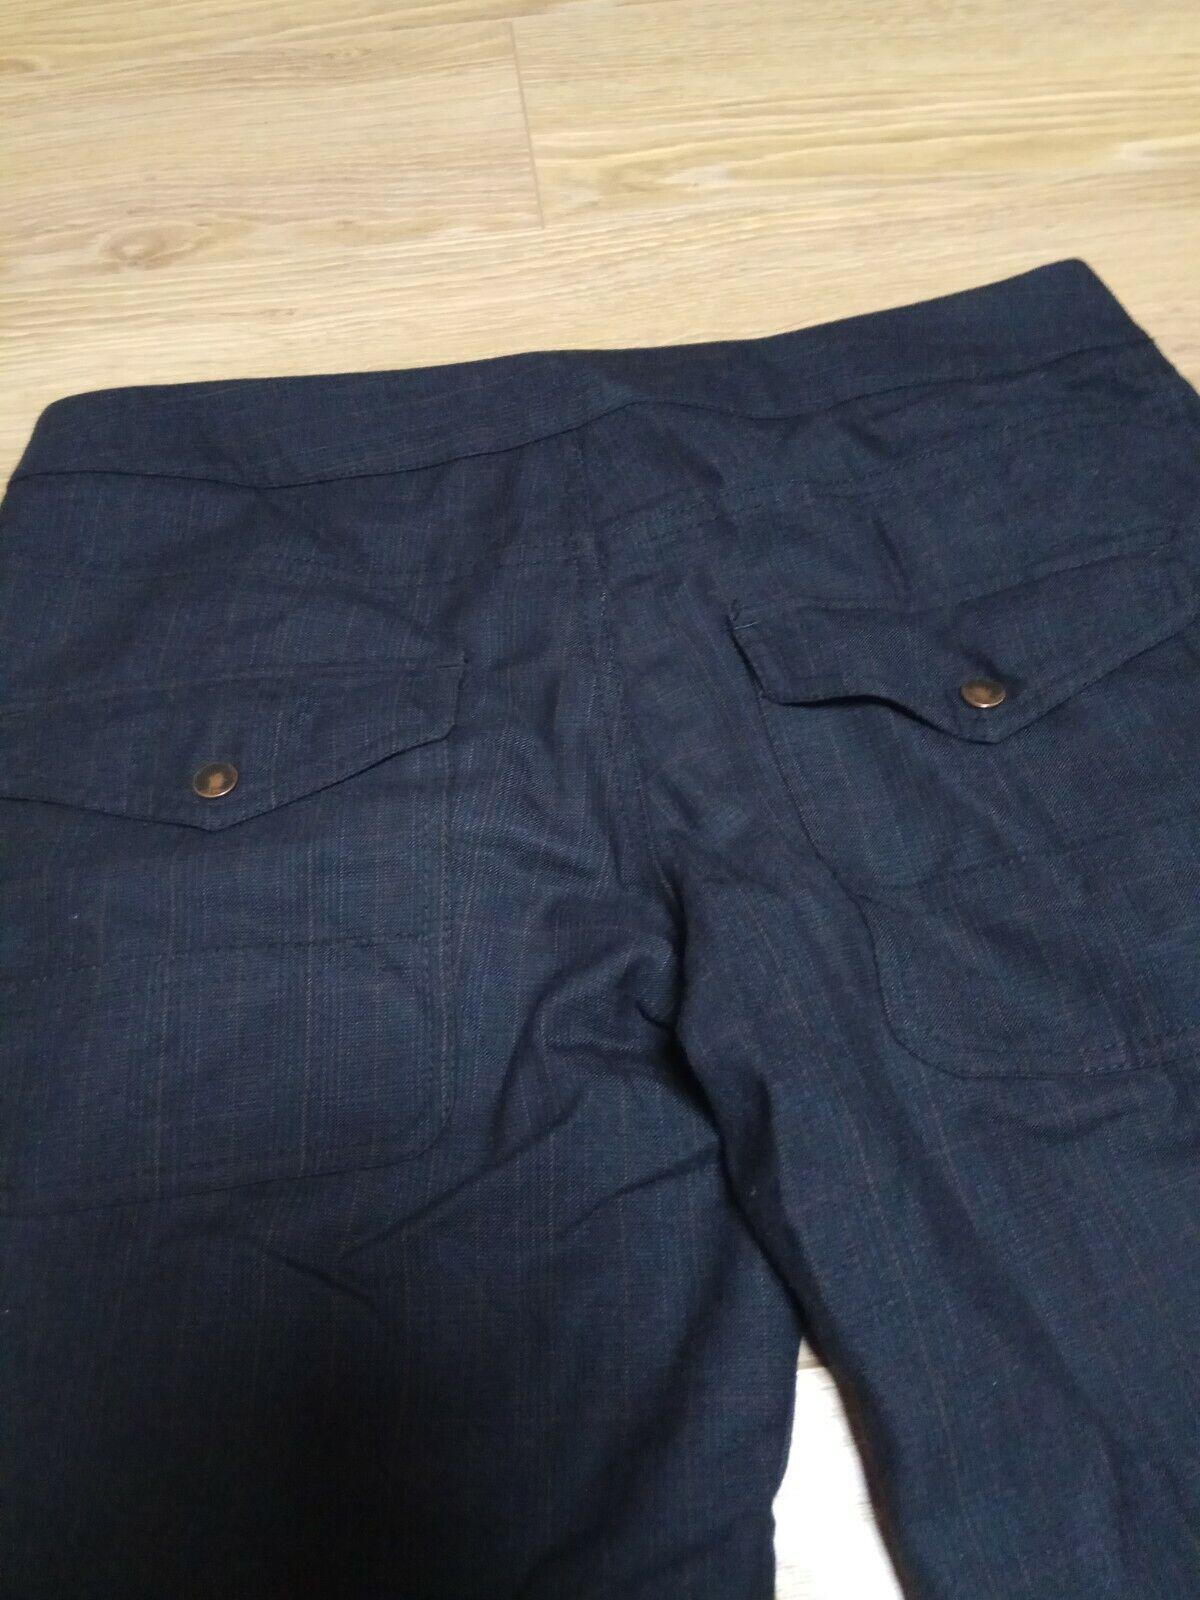 Hugo Boss James Black/grey Wool Dress Pants Micro… - image 7